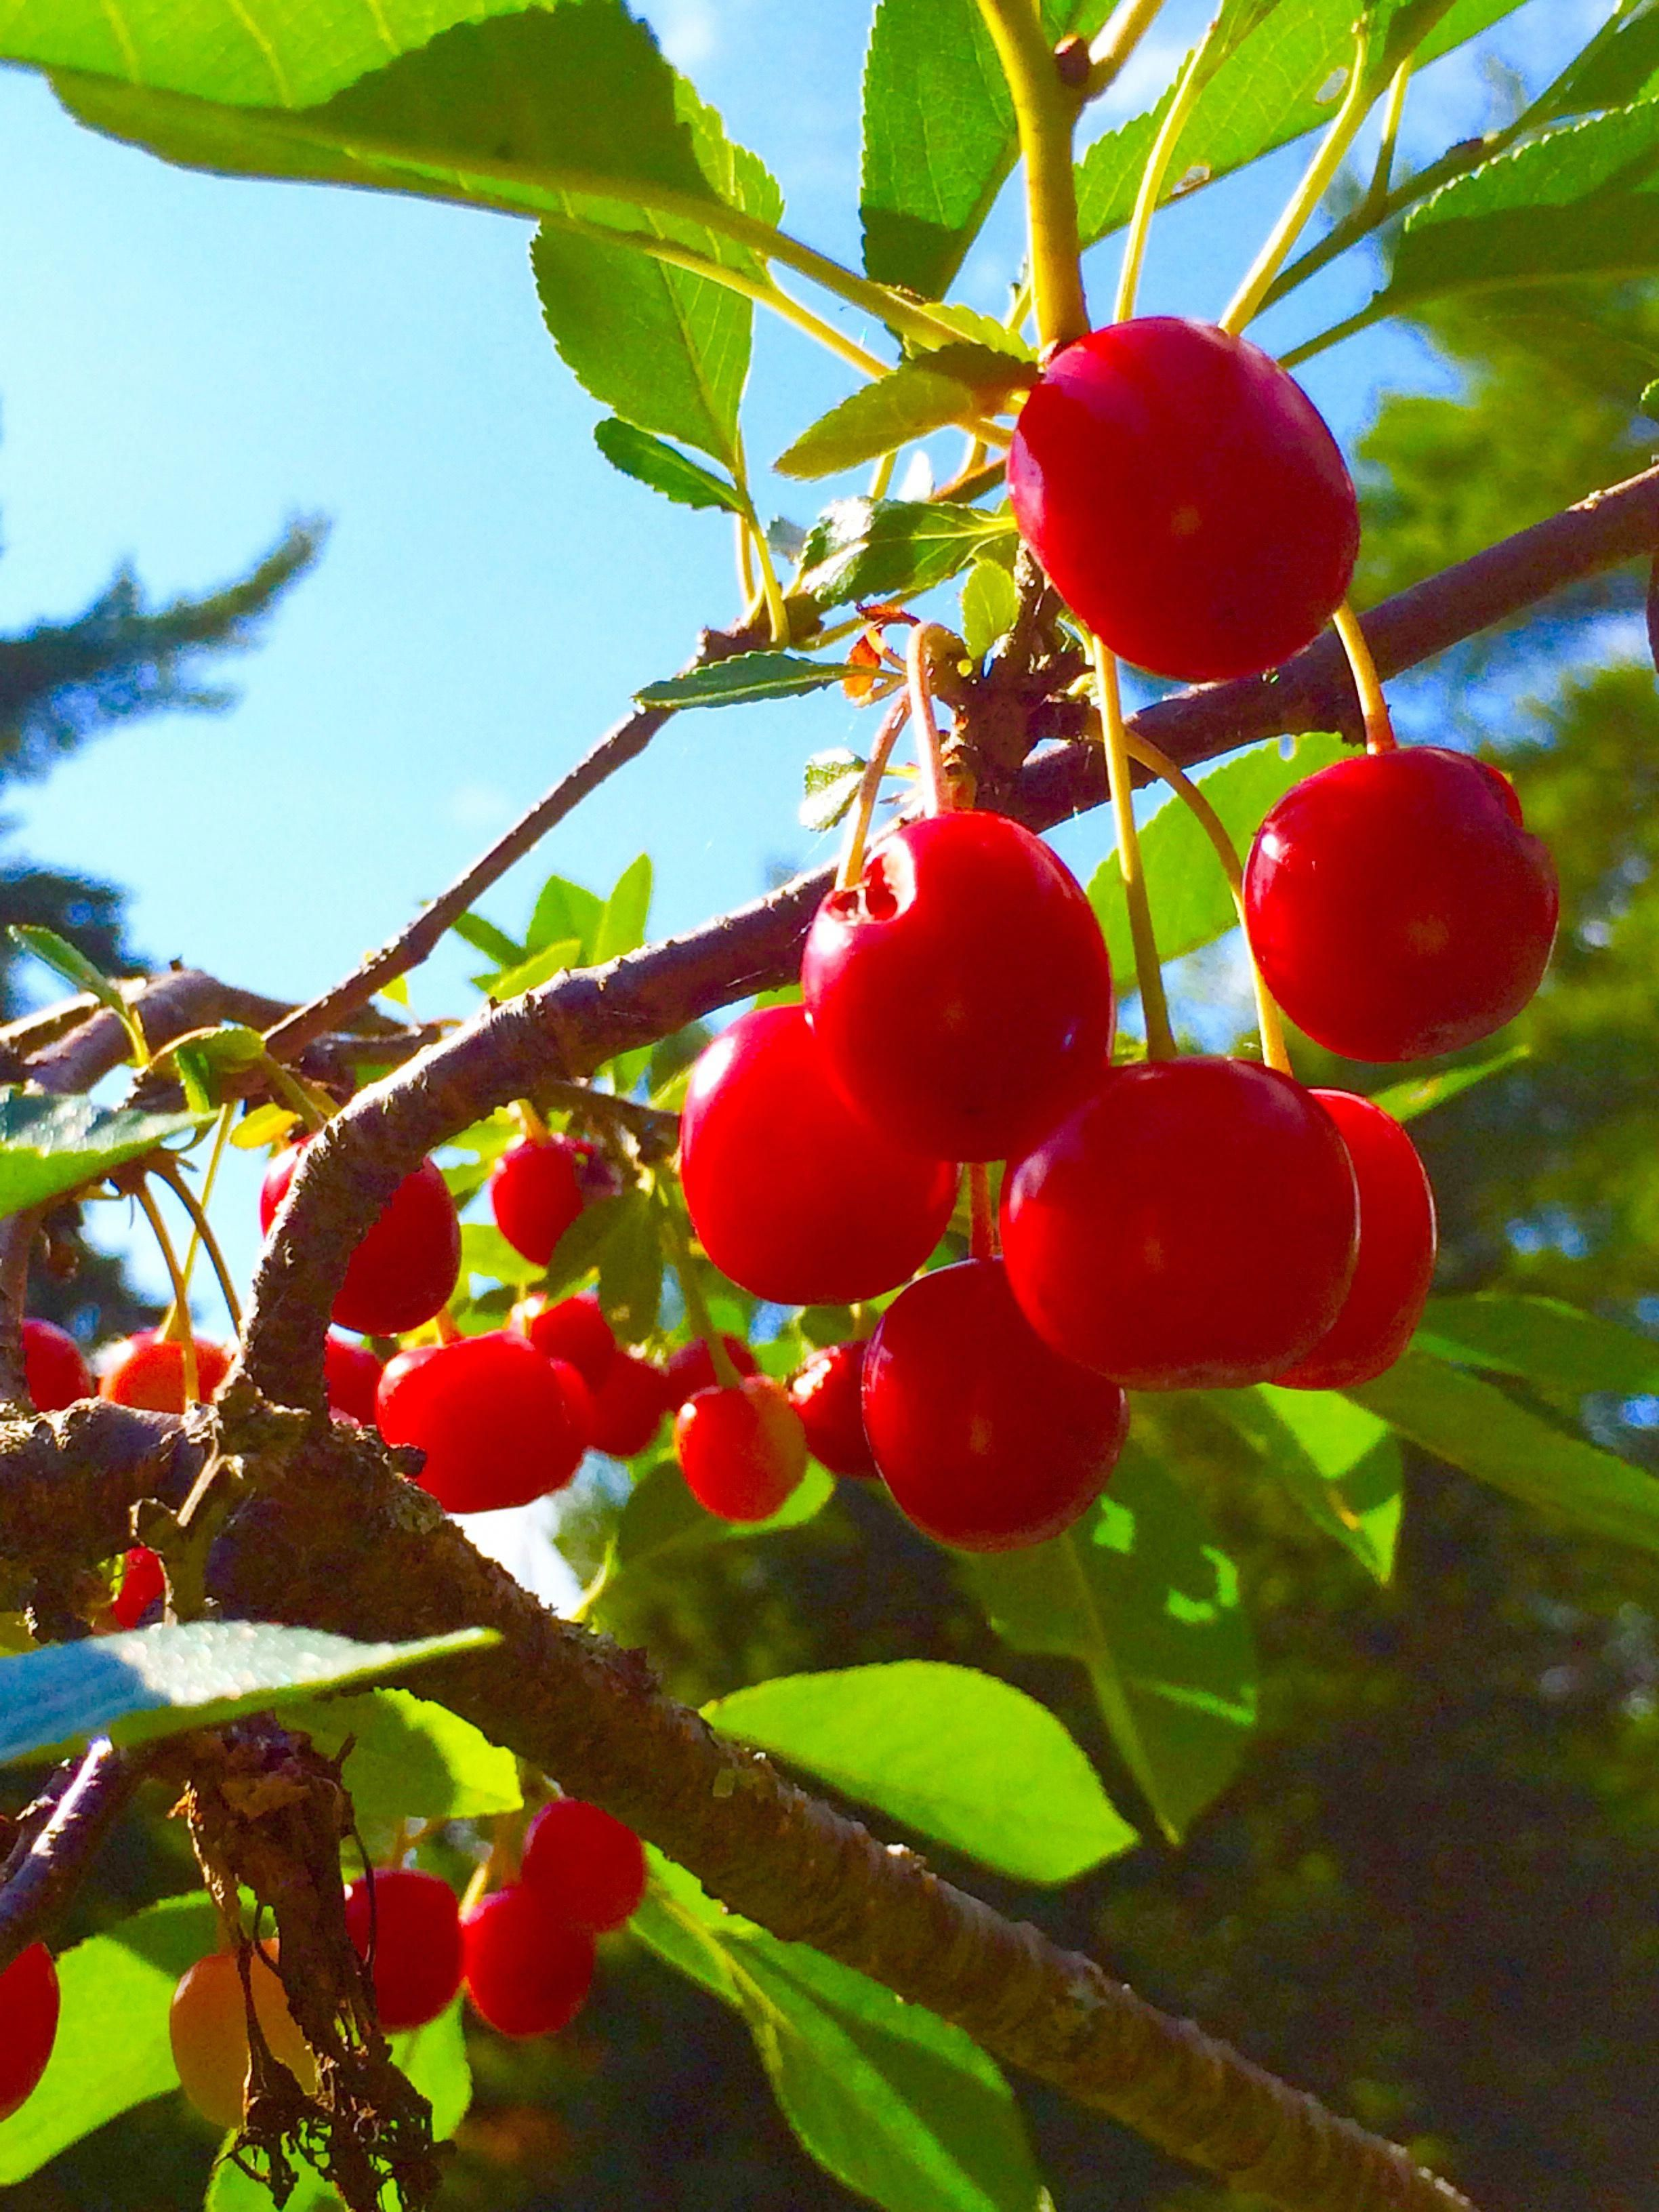 Cherries Grown In Esko Mn Growinggrapesinmn Wine Making Supplies Personalized Wine Glass Wine Making Kits